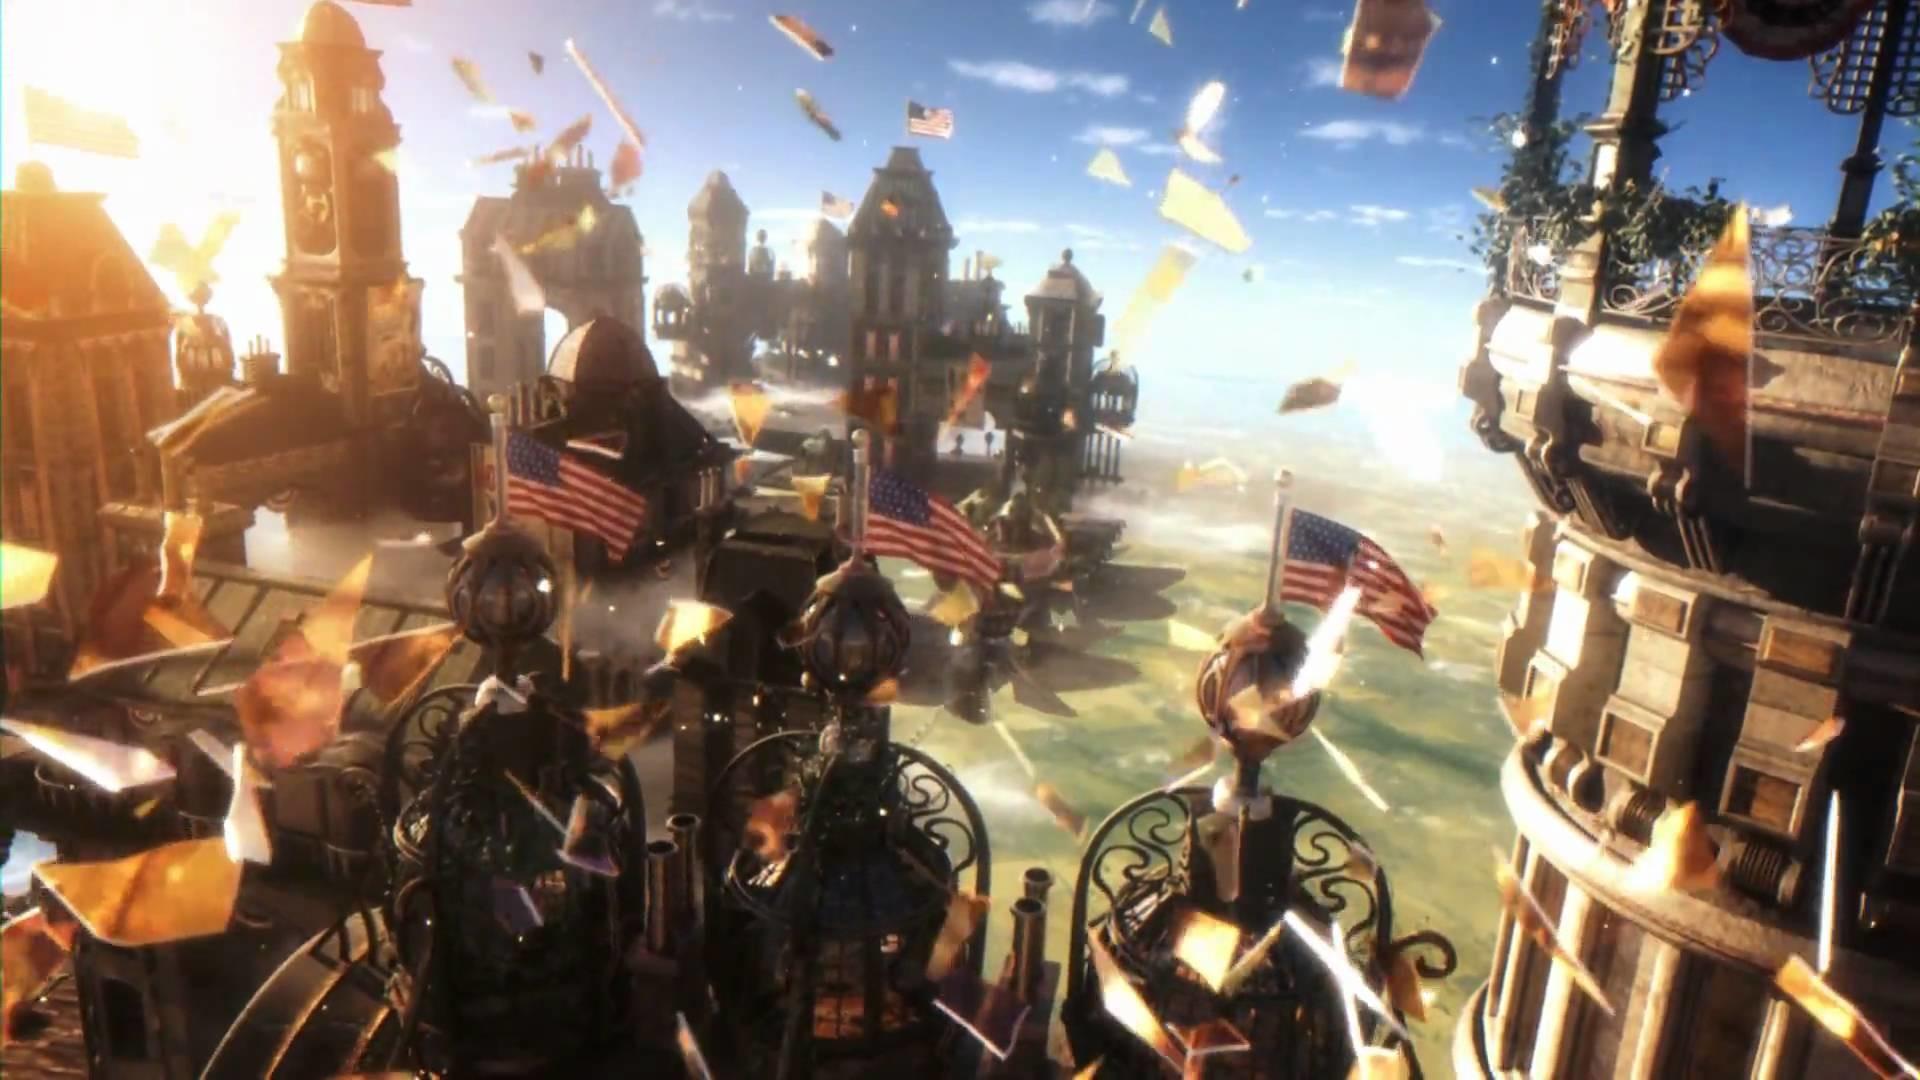 BioShock: Infinite 'Debut Trailer' [1080p] TRUE-HD QUALITY